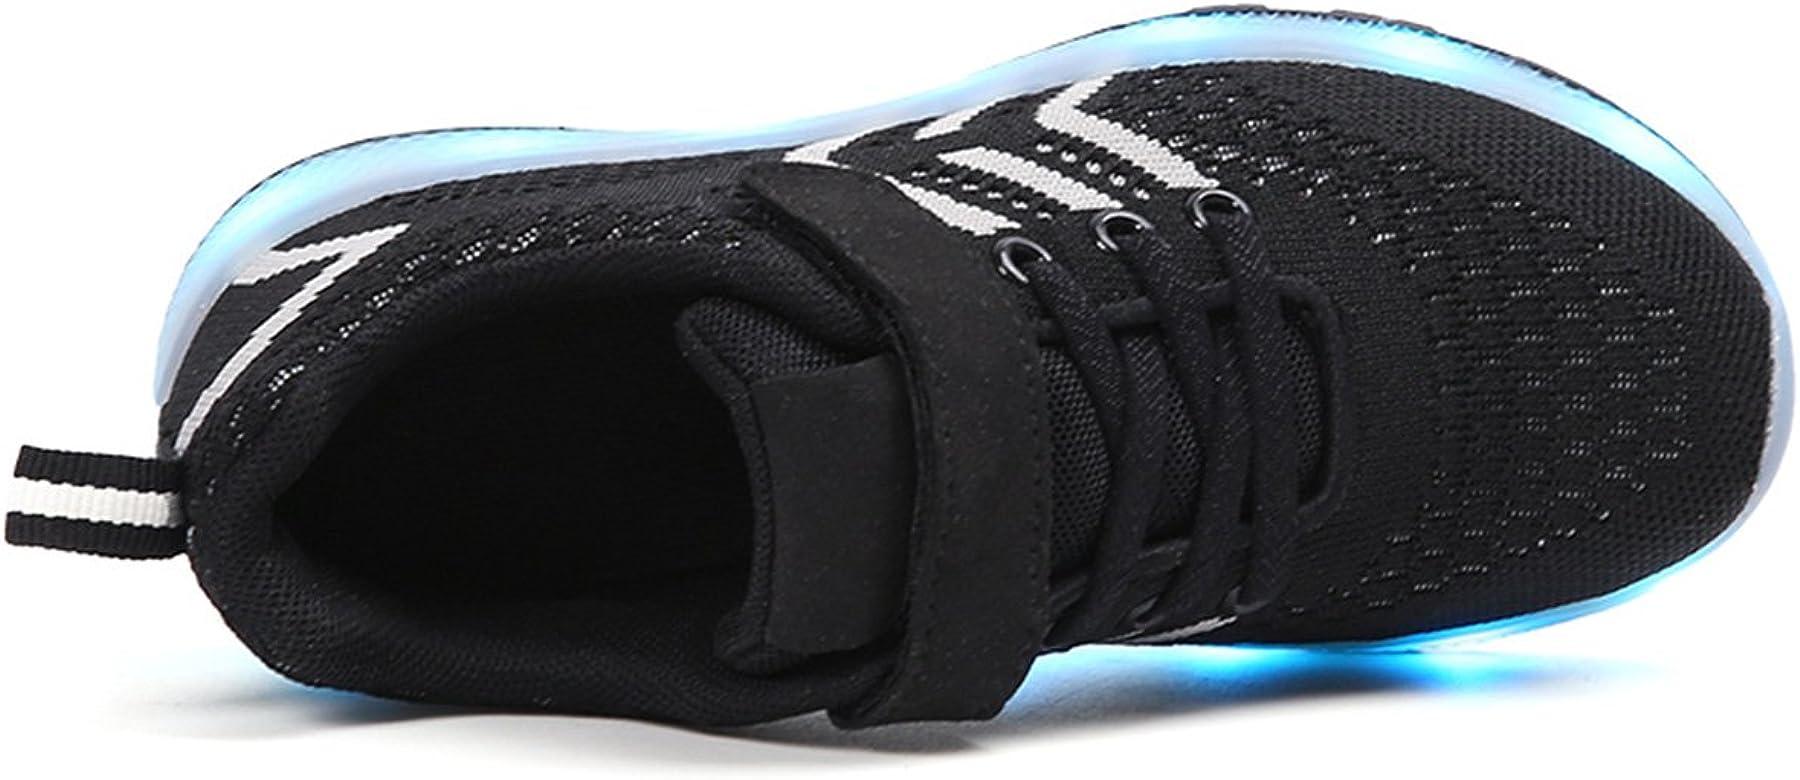 Ajerlu Bevoker Kids LED Light Up Sneakers 11 Colors Sports Dancing Flashing Shoes for Boys Girls USB Charging